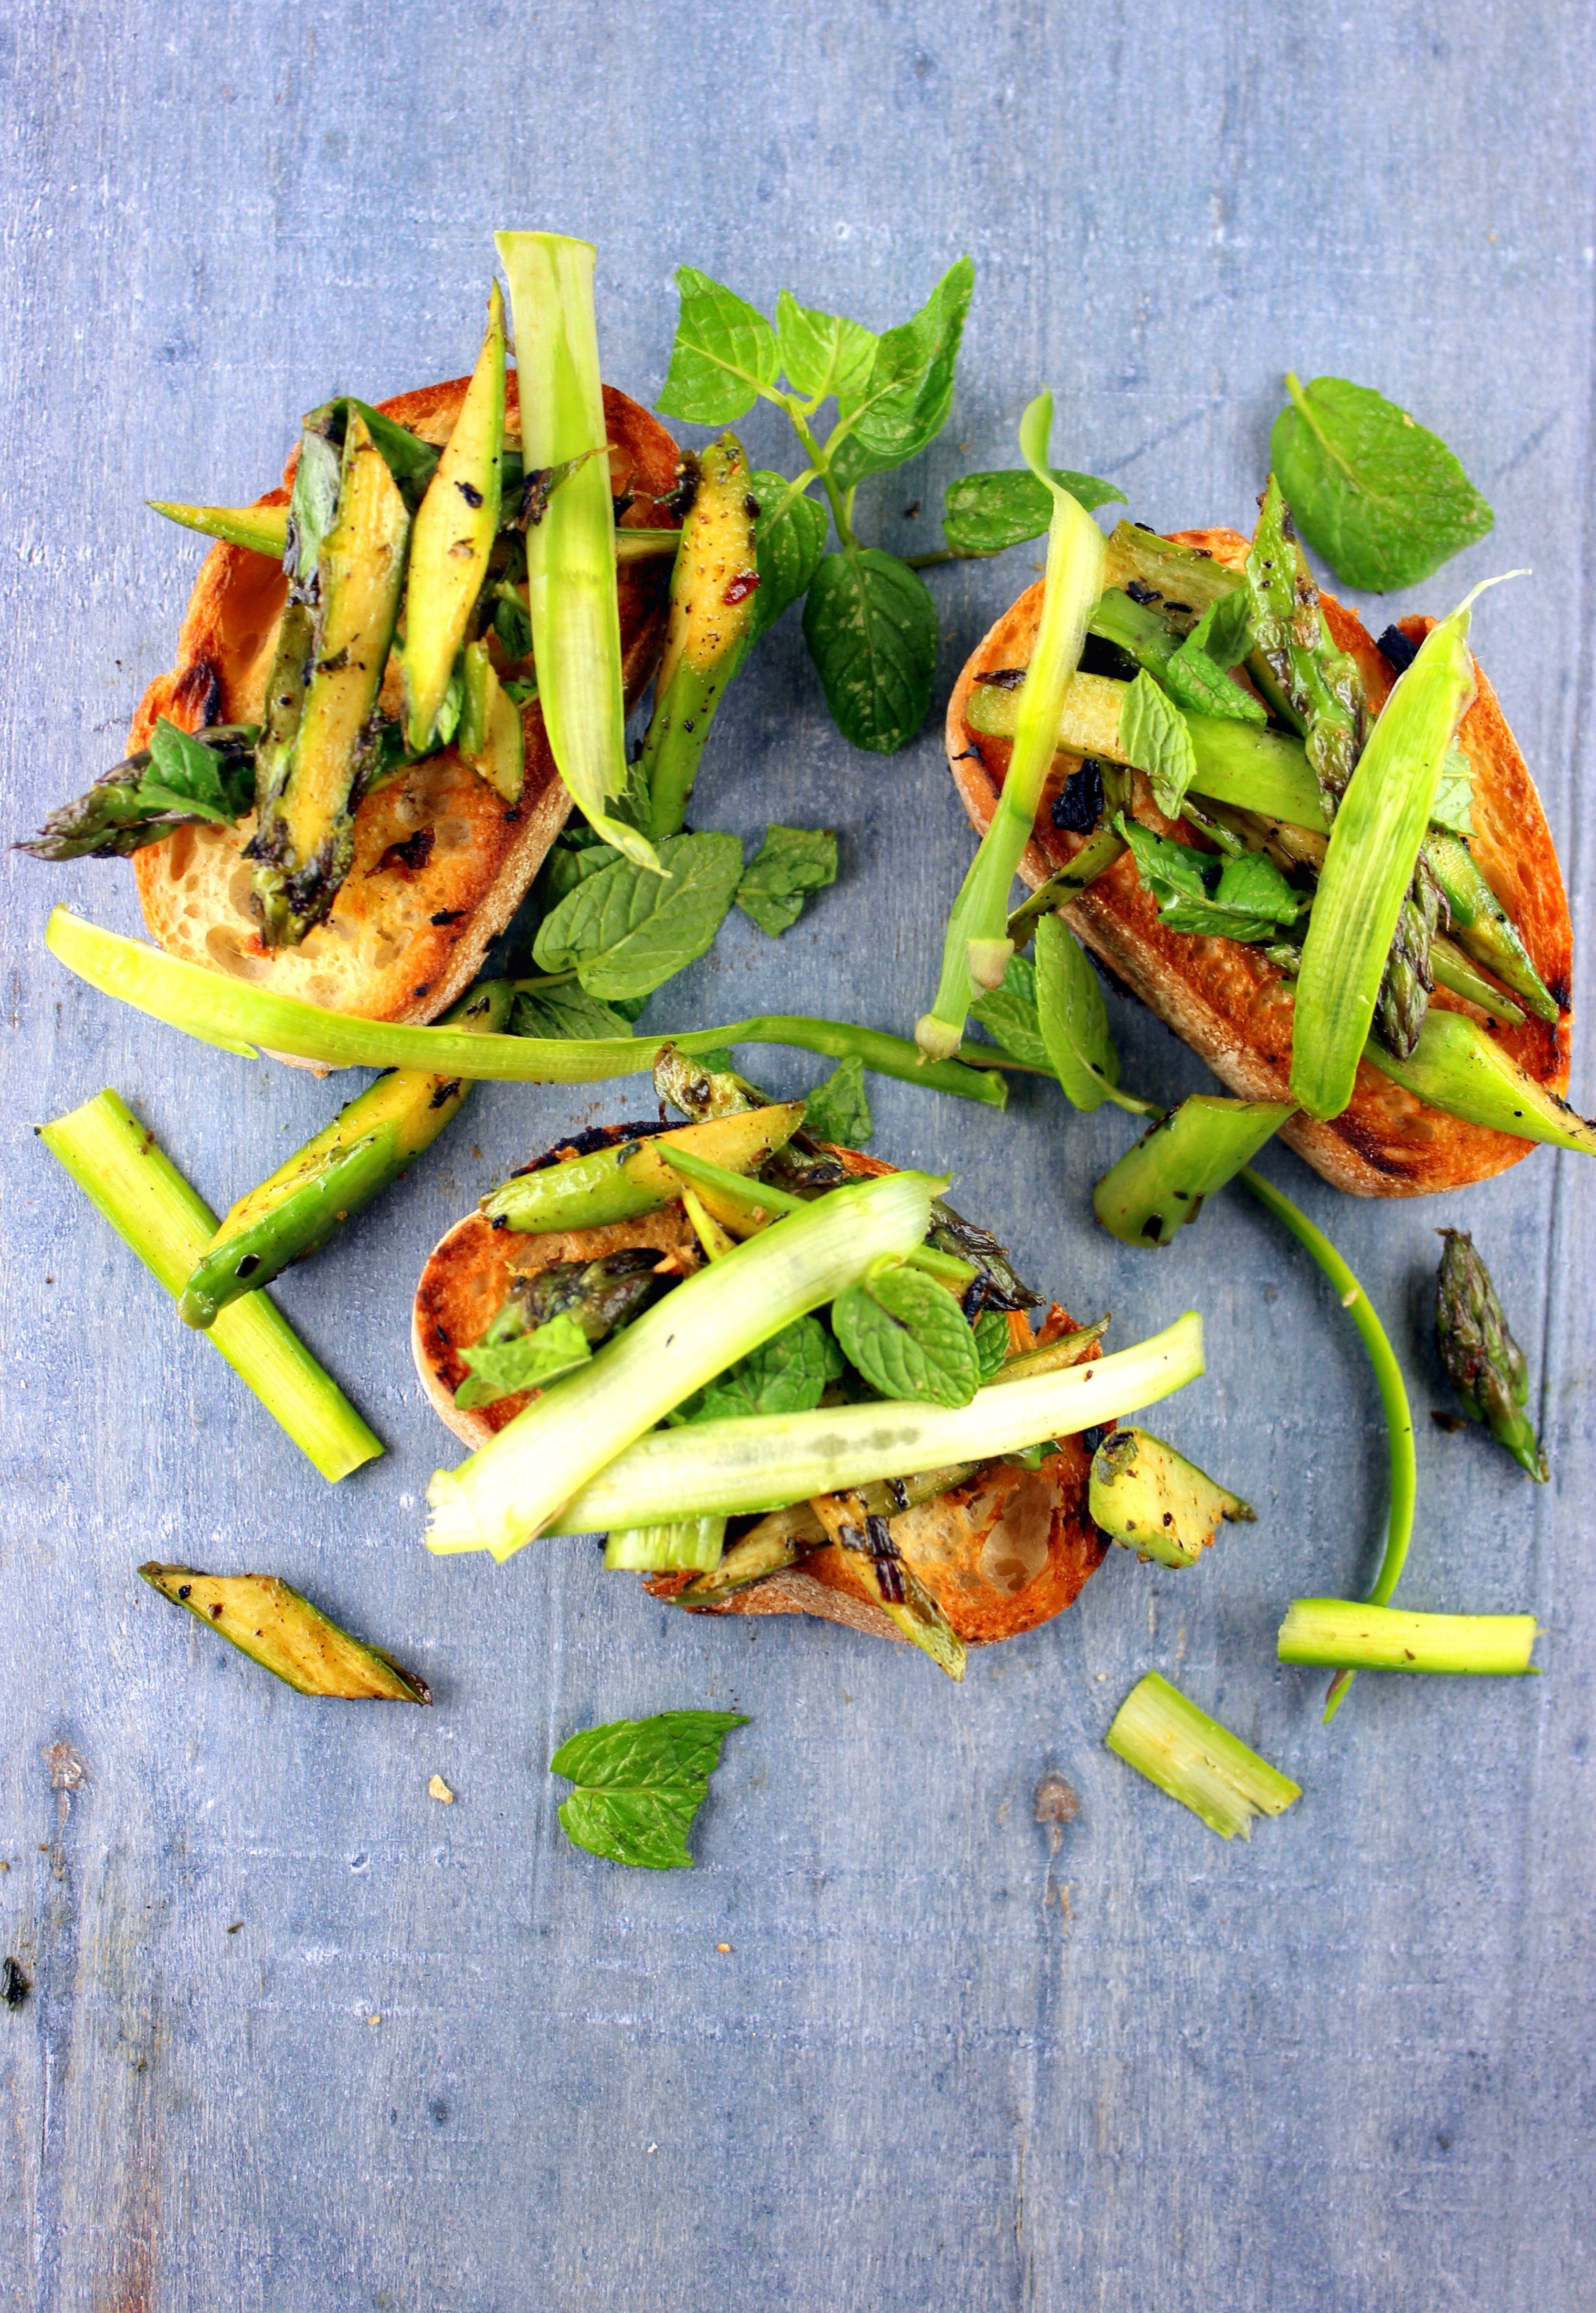 So simple and good! Green asparagus, bread and mint http://gaumenthrill.blogspot.de/2014/04/kuchenquickie-brot-mit-spargel-und-minze.html